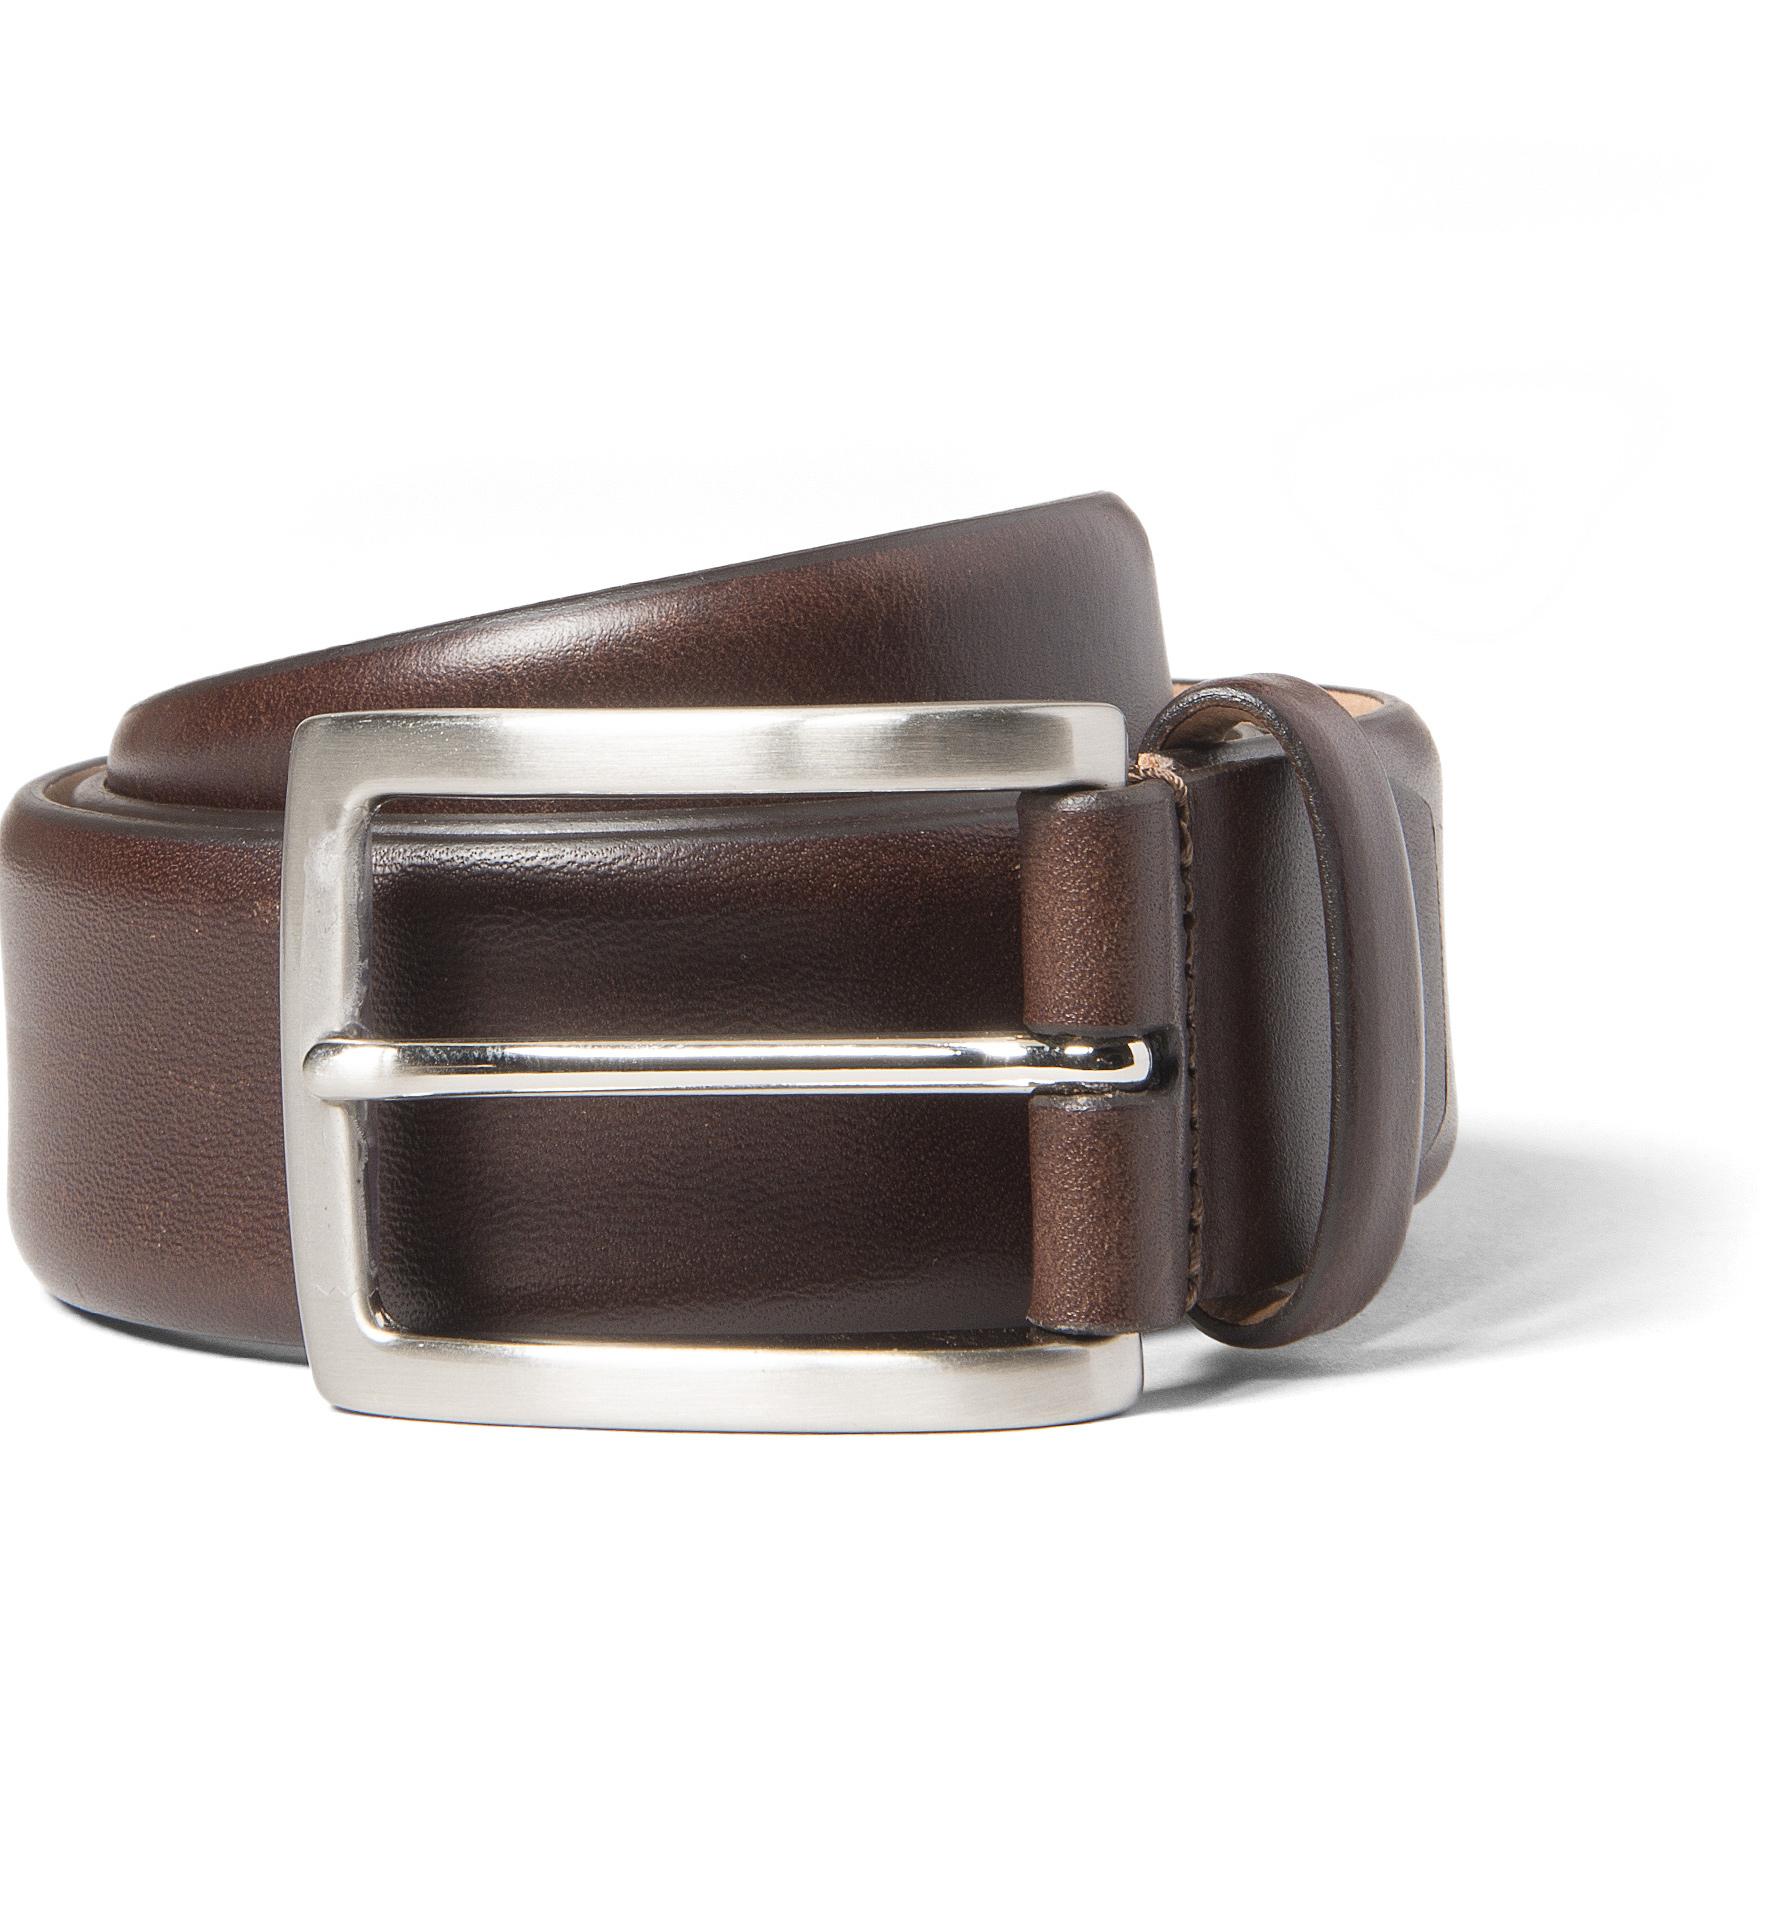 Zoom Image of Walnut Vachetta Leather Belt